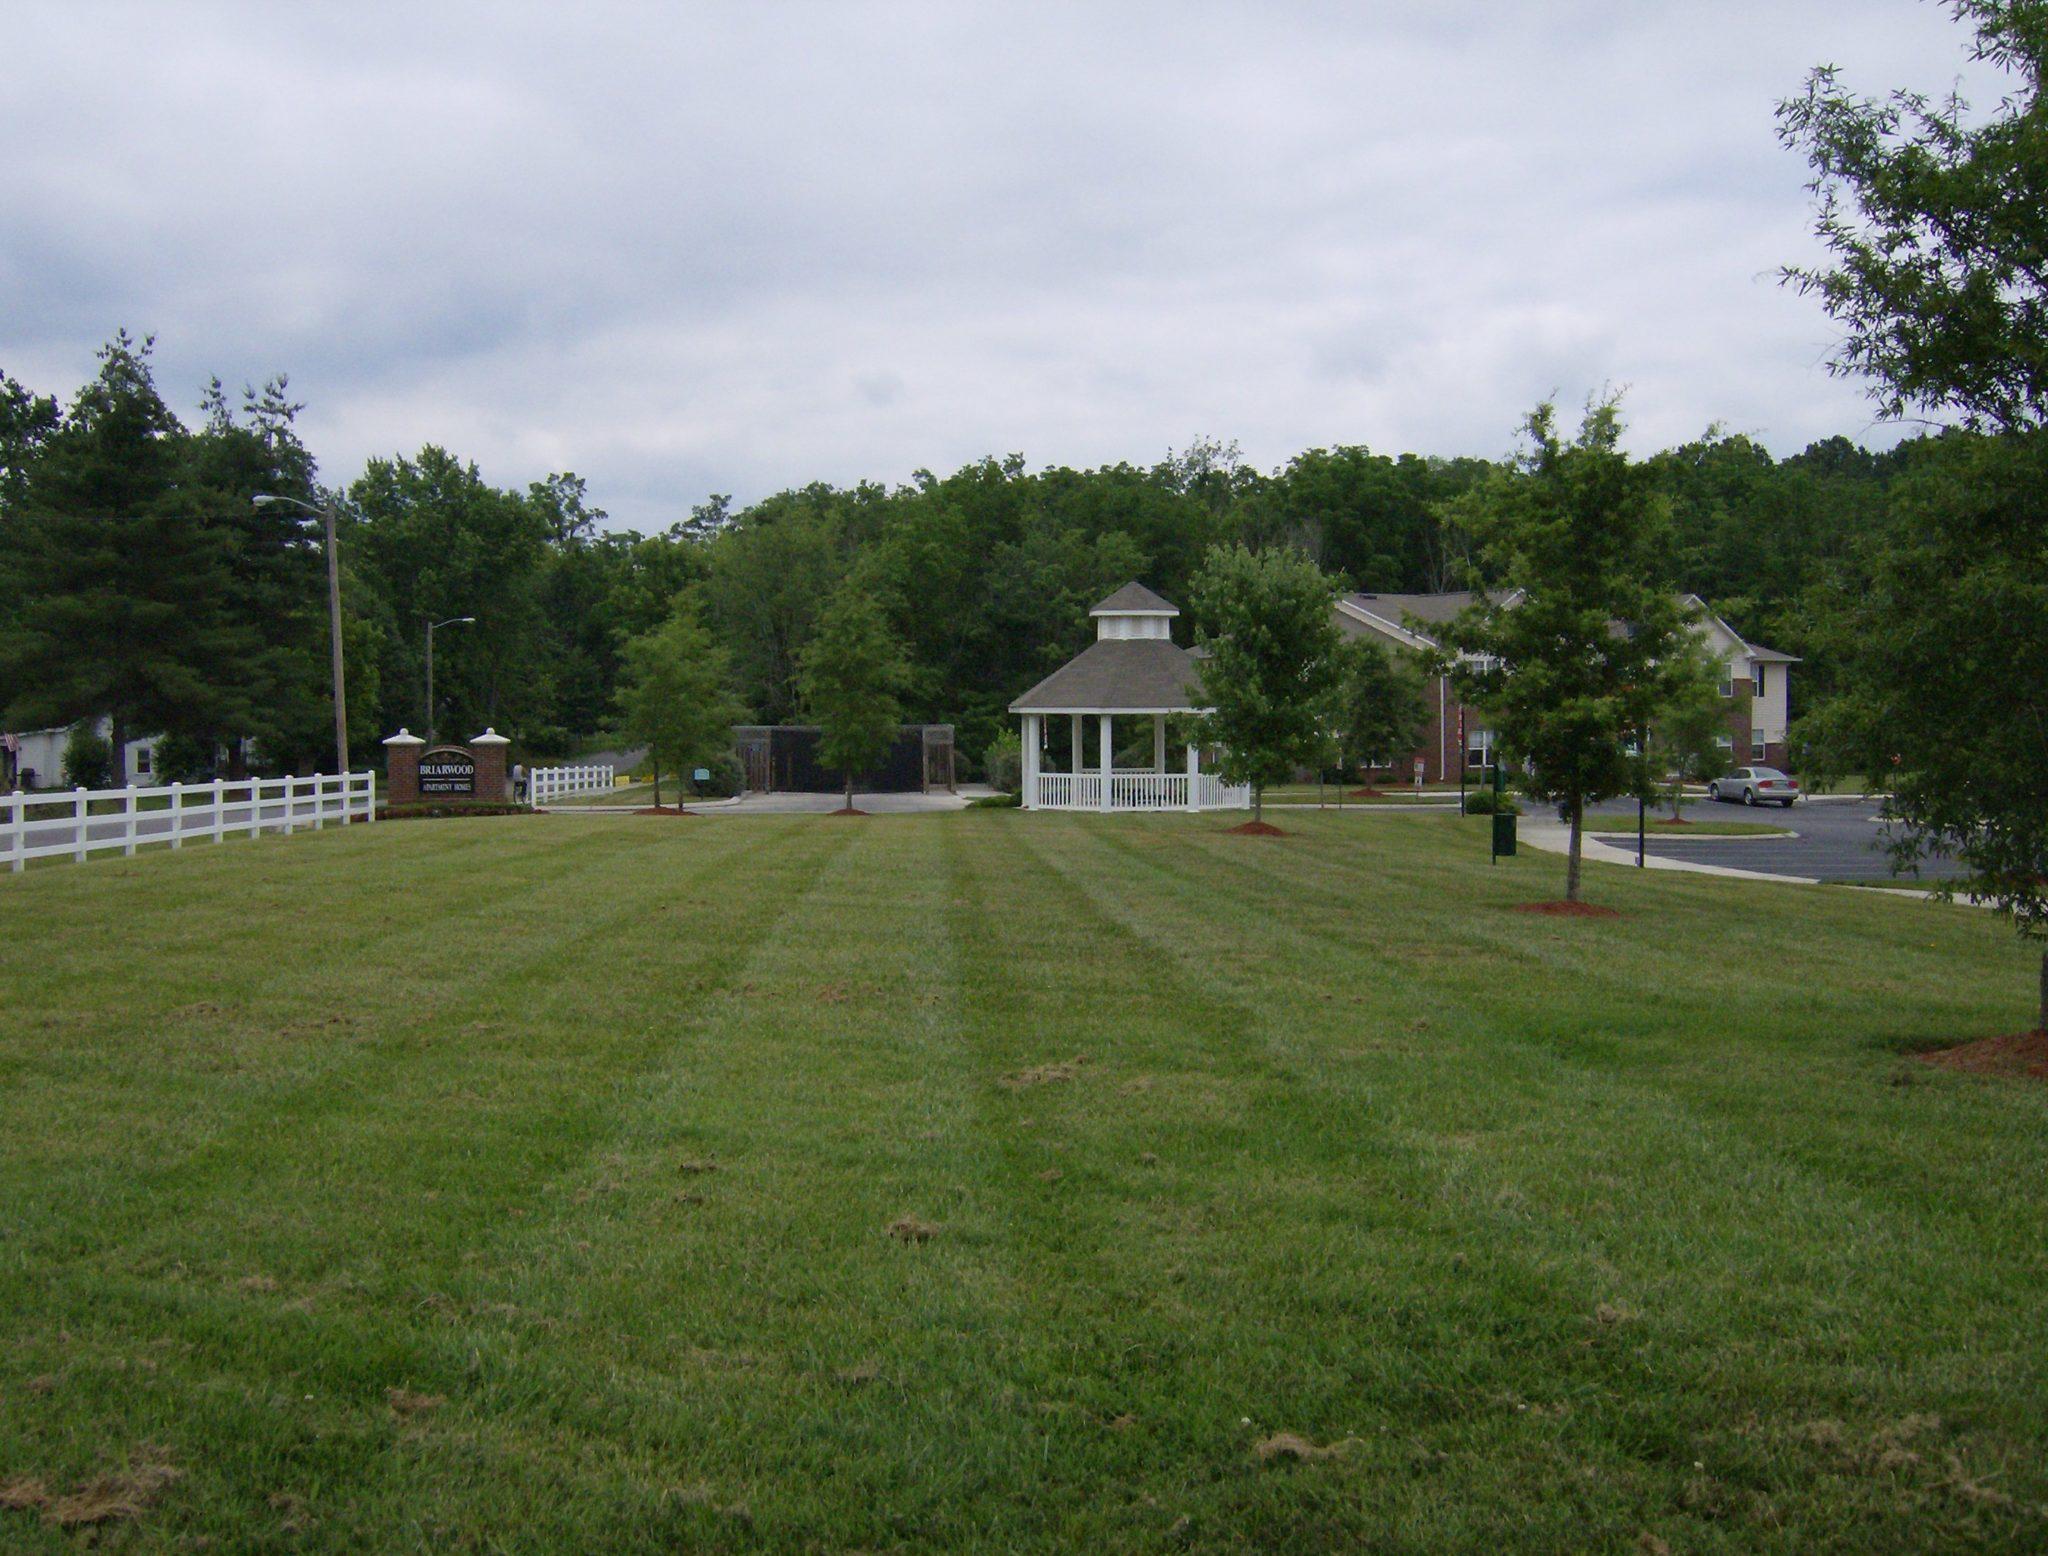 Briarwood Dog walk area and entrance